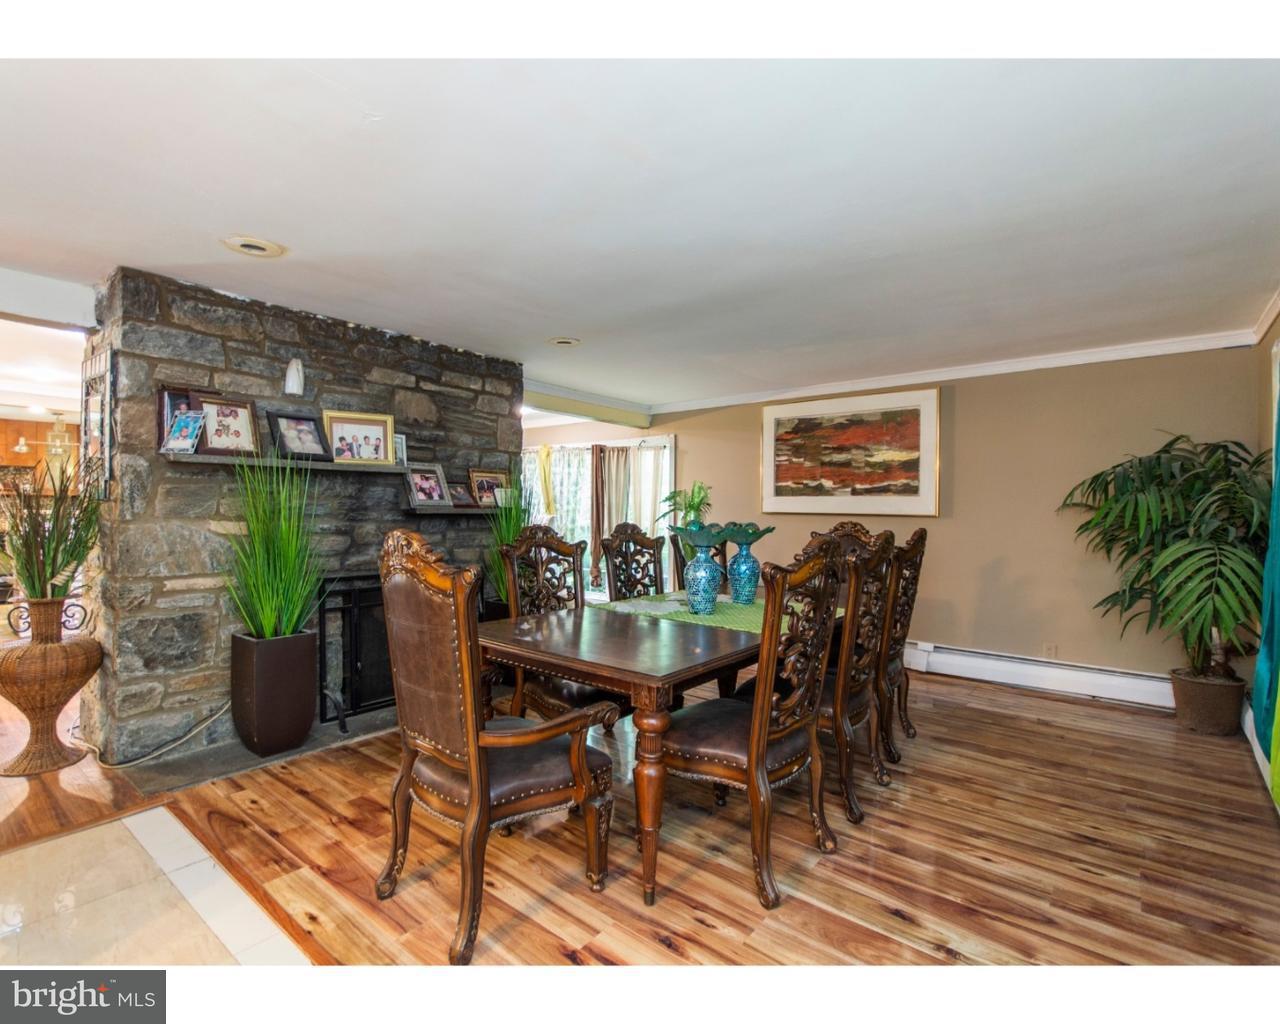 1416 MELLON RD, WYNCOTE - Listed at $335,000, WYNCOTE